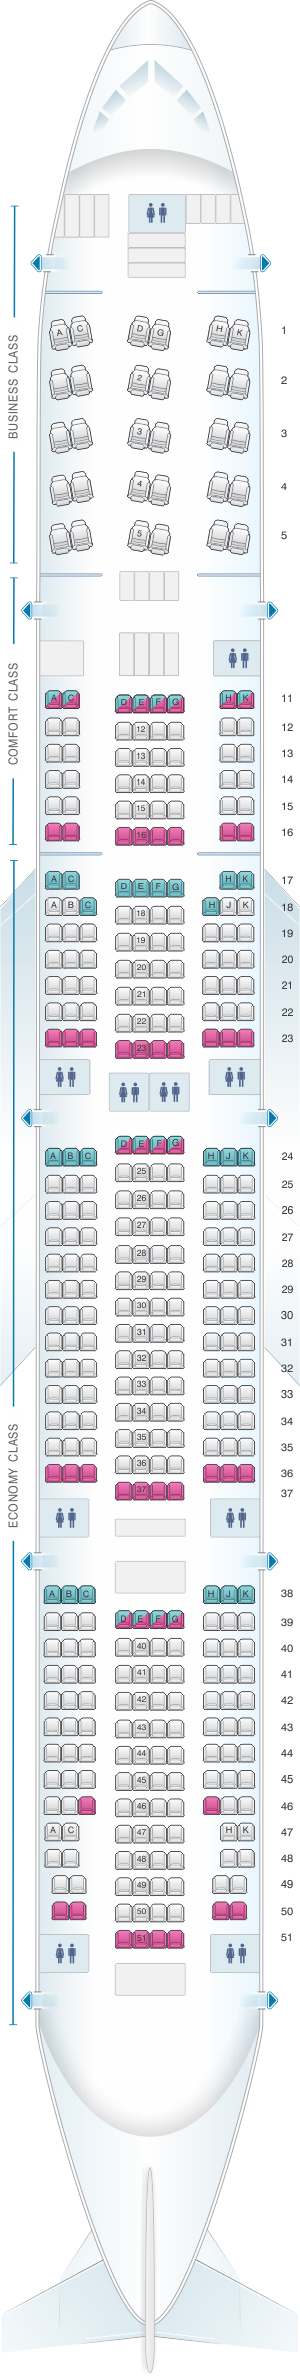 Plan de cabine aeroflot russian airlines boeing b777 300er for Plan cabine 777 300er